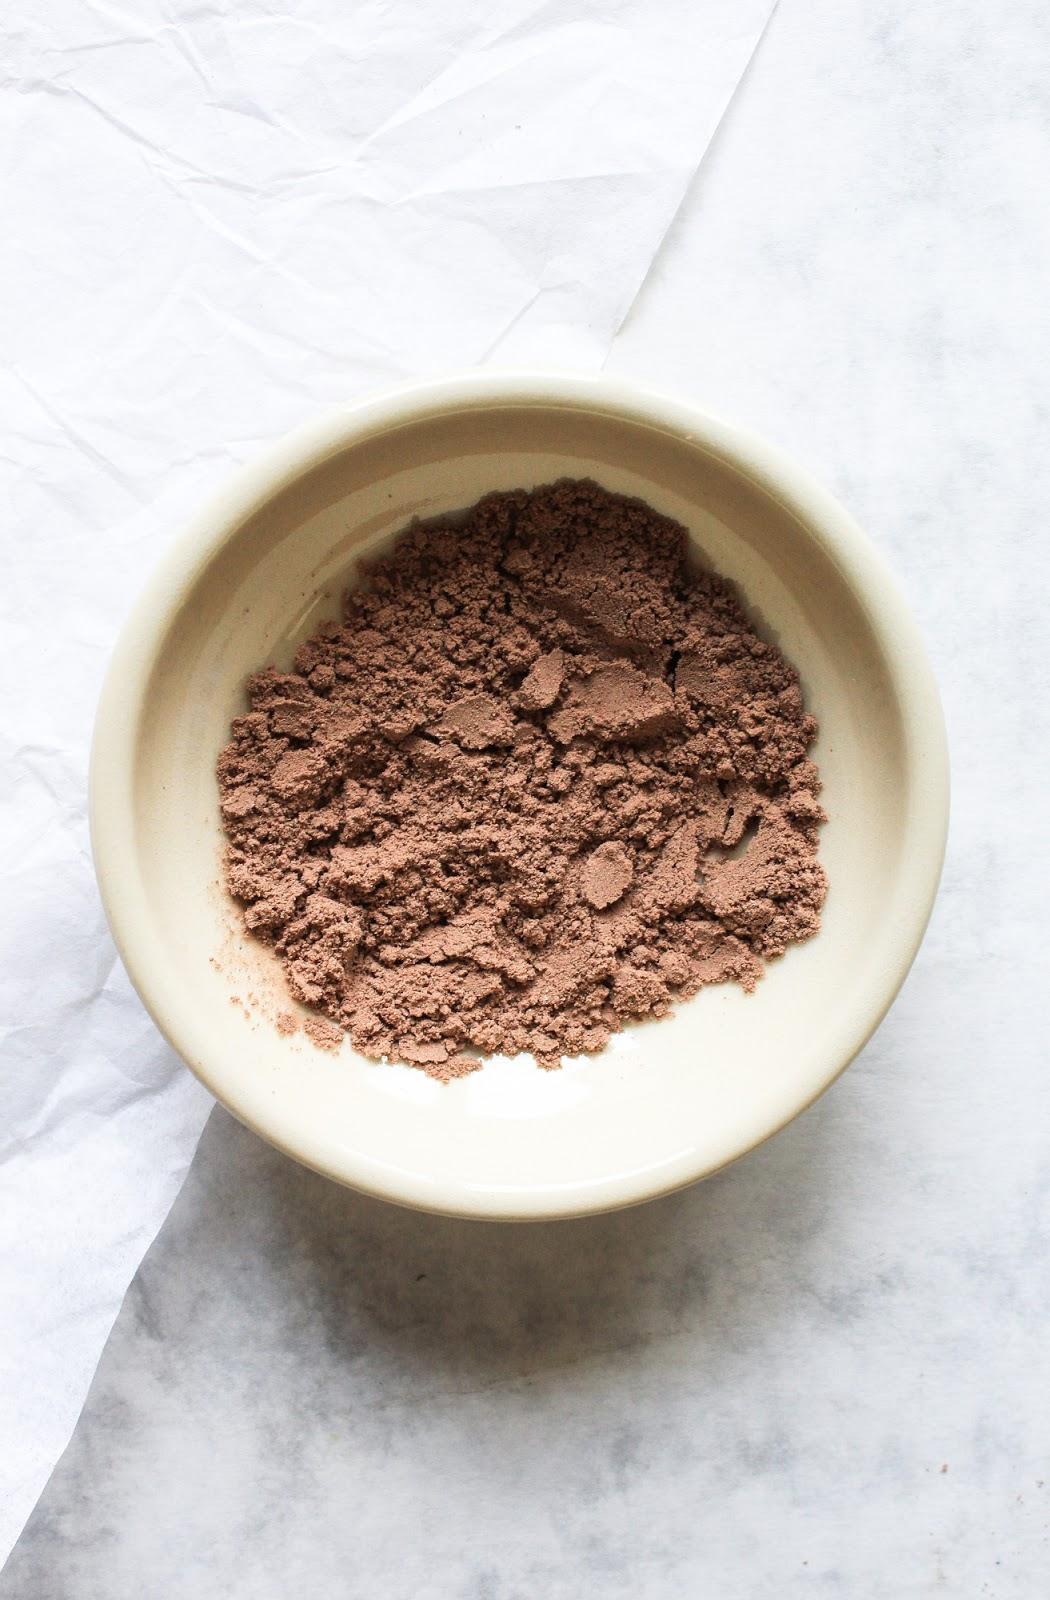 Leahlani Skincare Kokoleka Ritual Dessert Facial Mask. Detoxifying, rich in antioxidants